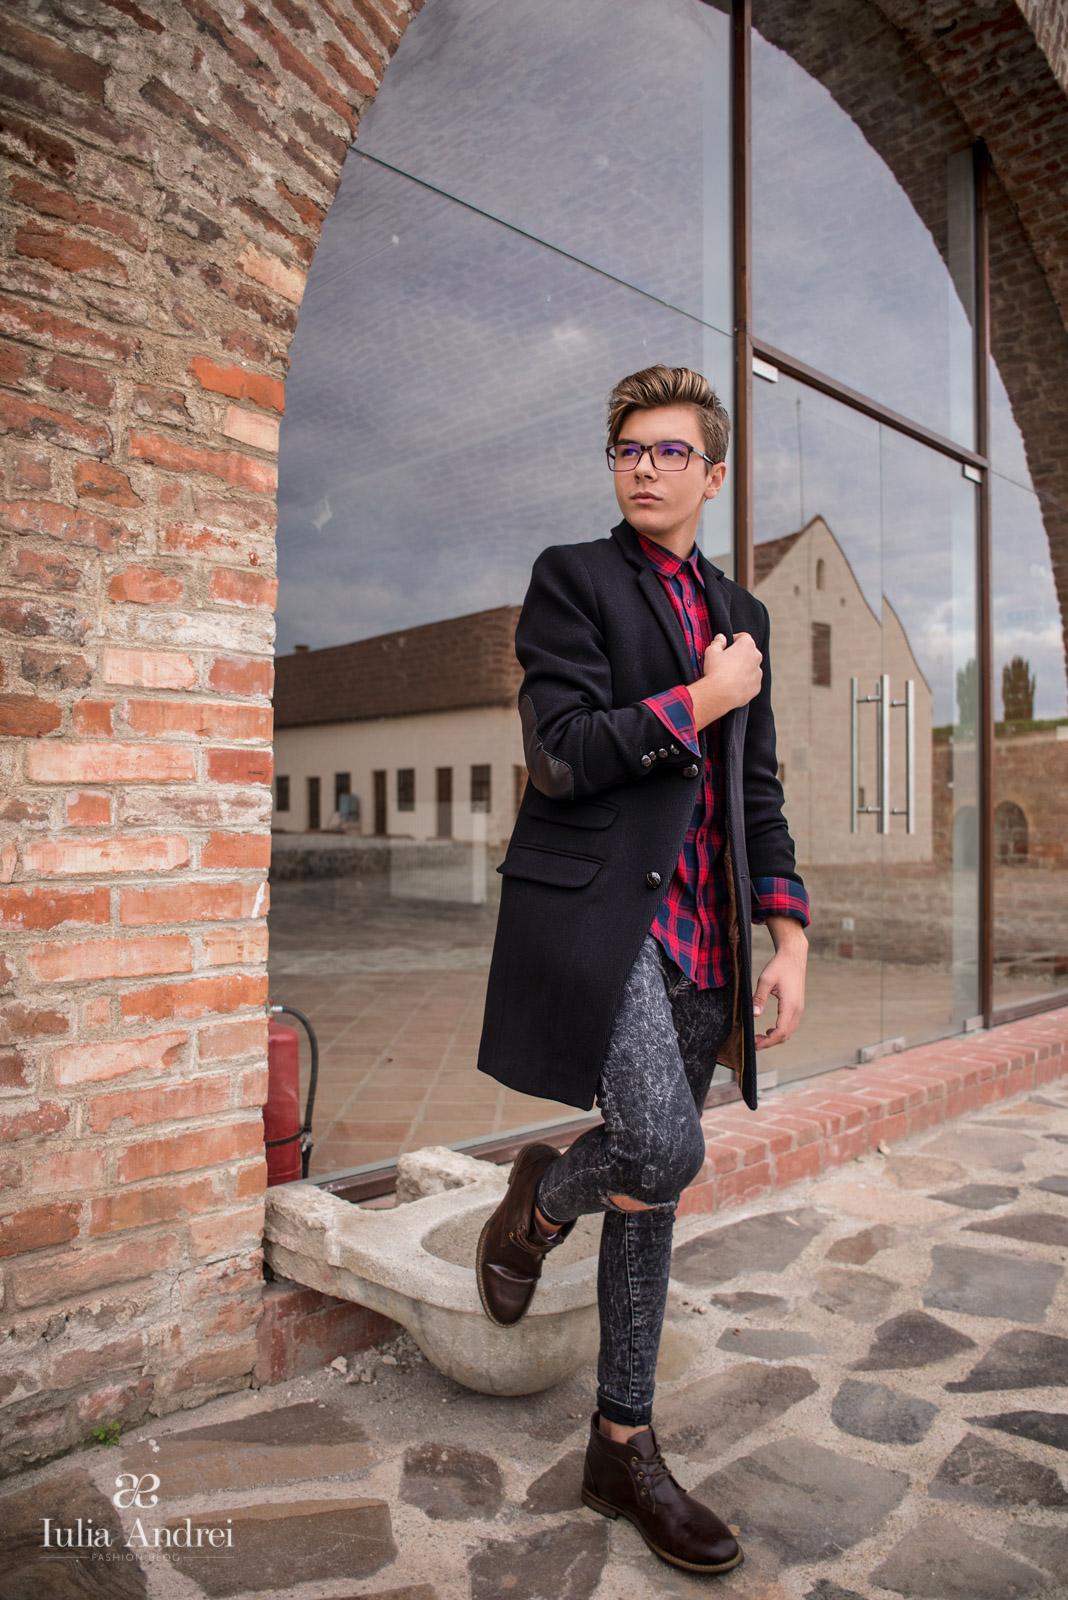 Palton de barbati pentru noul sezon - Catalin Maior - Colaborare Iulia Andrei